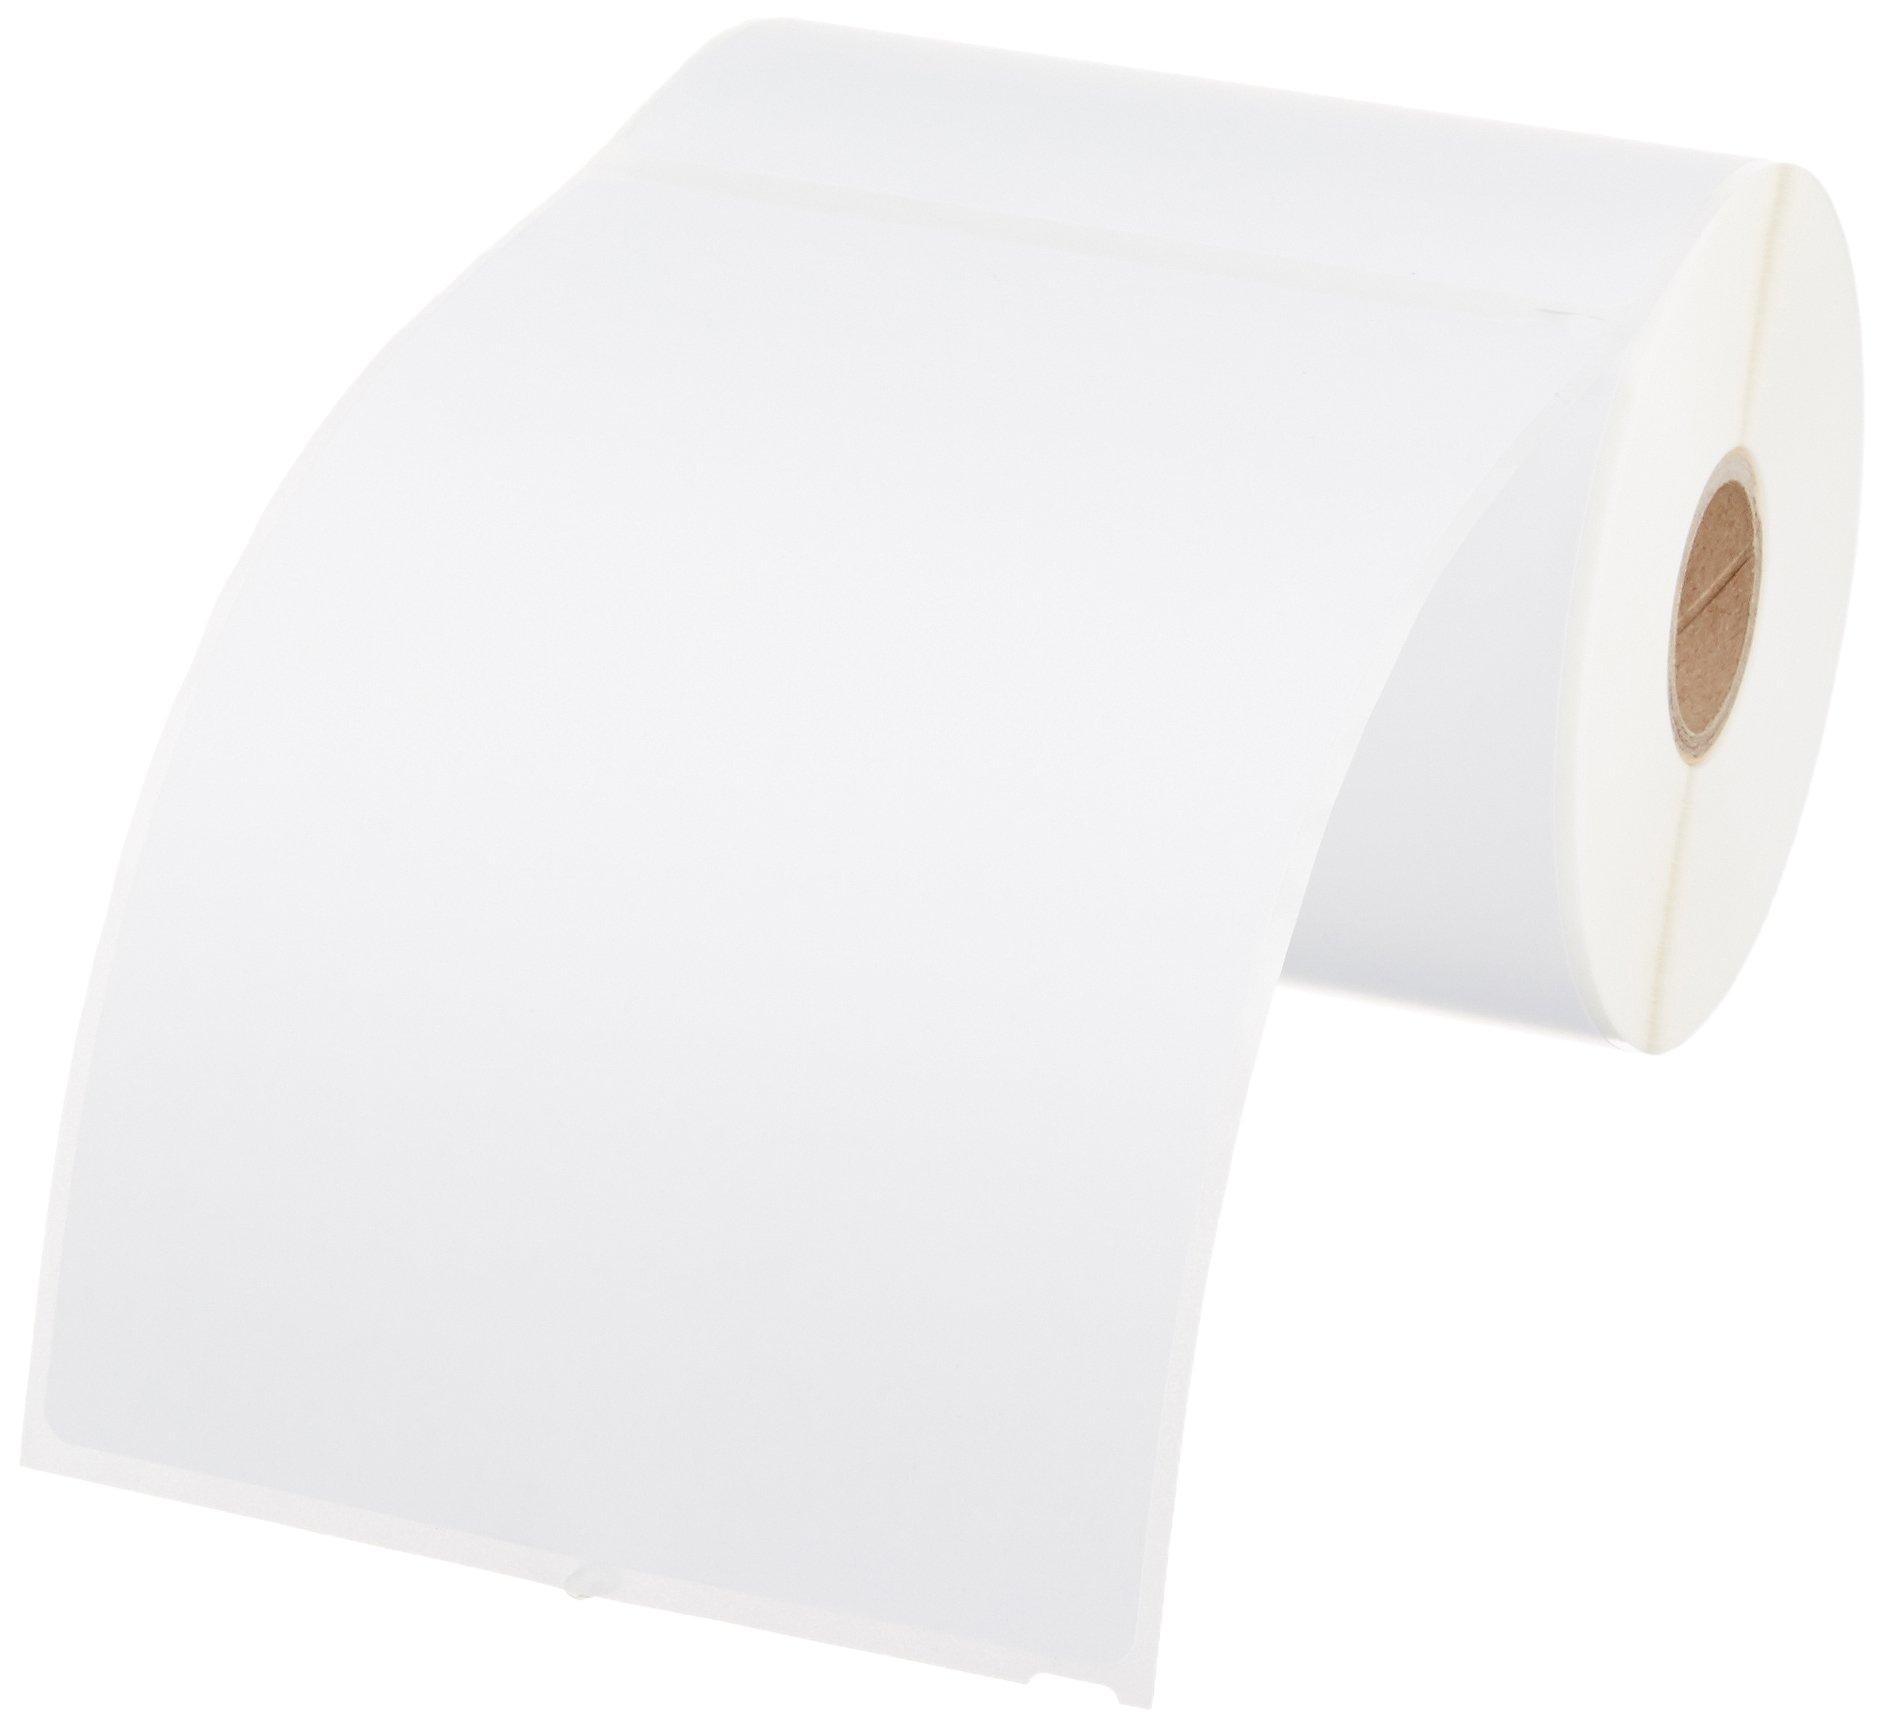 AmazonBasics Multi-Purpose Labels for Label Printers, White, 4'' x 6'', 220 Labels per Roll, 4 Rolls by AmazonBasics (Image #2)